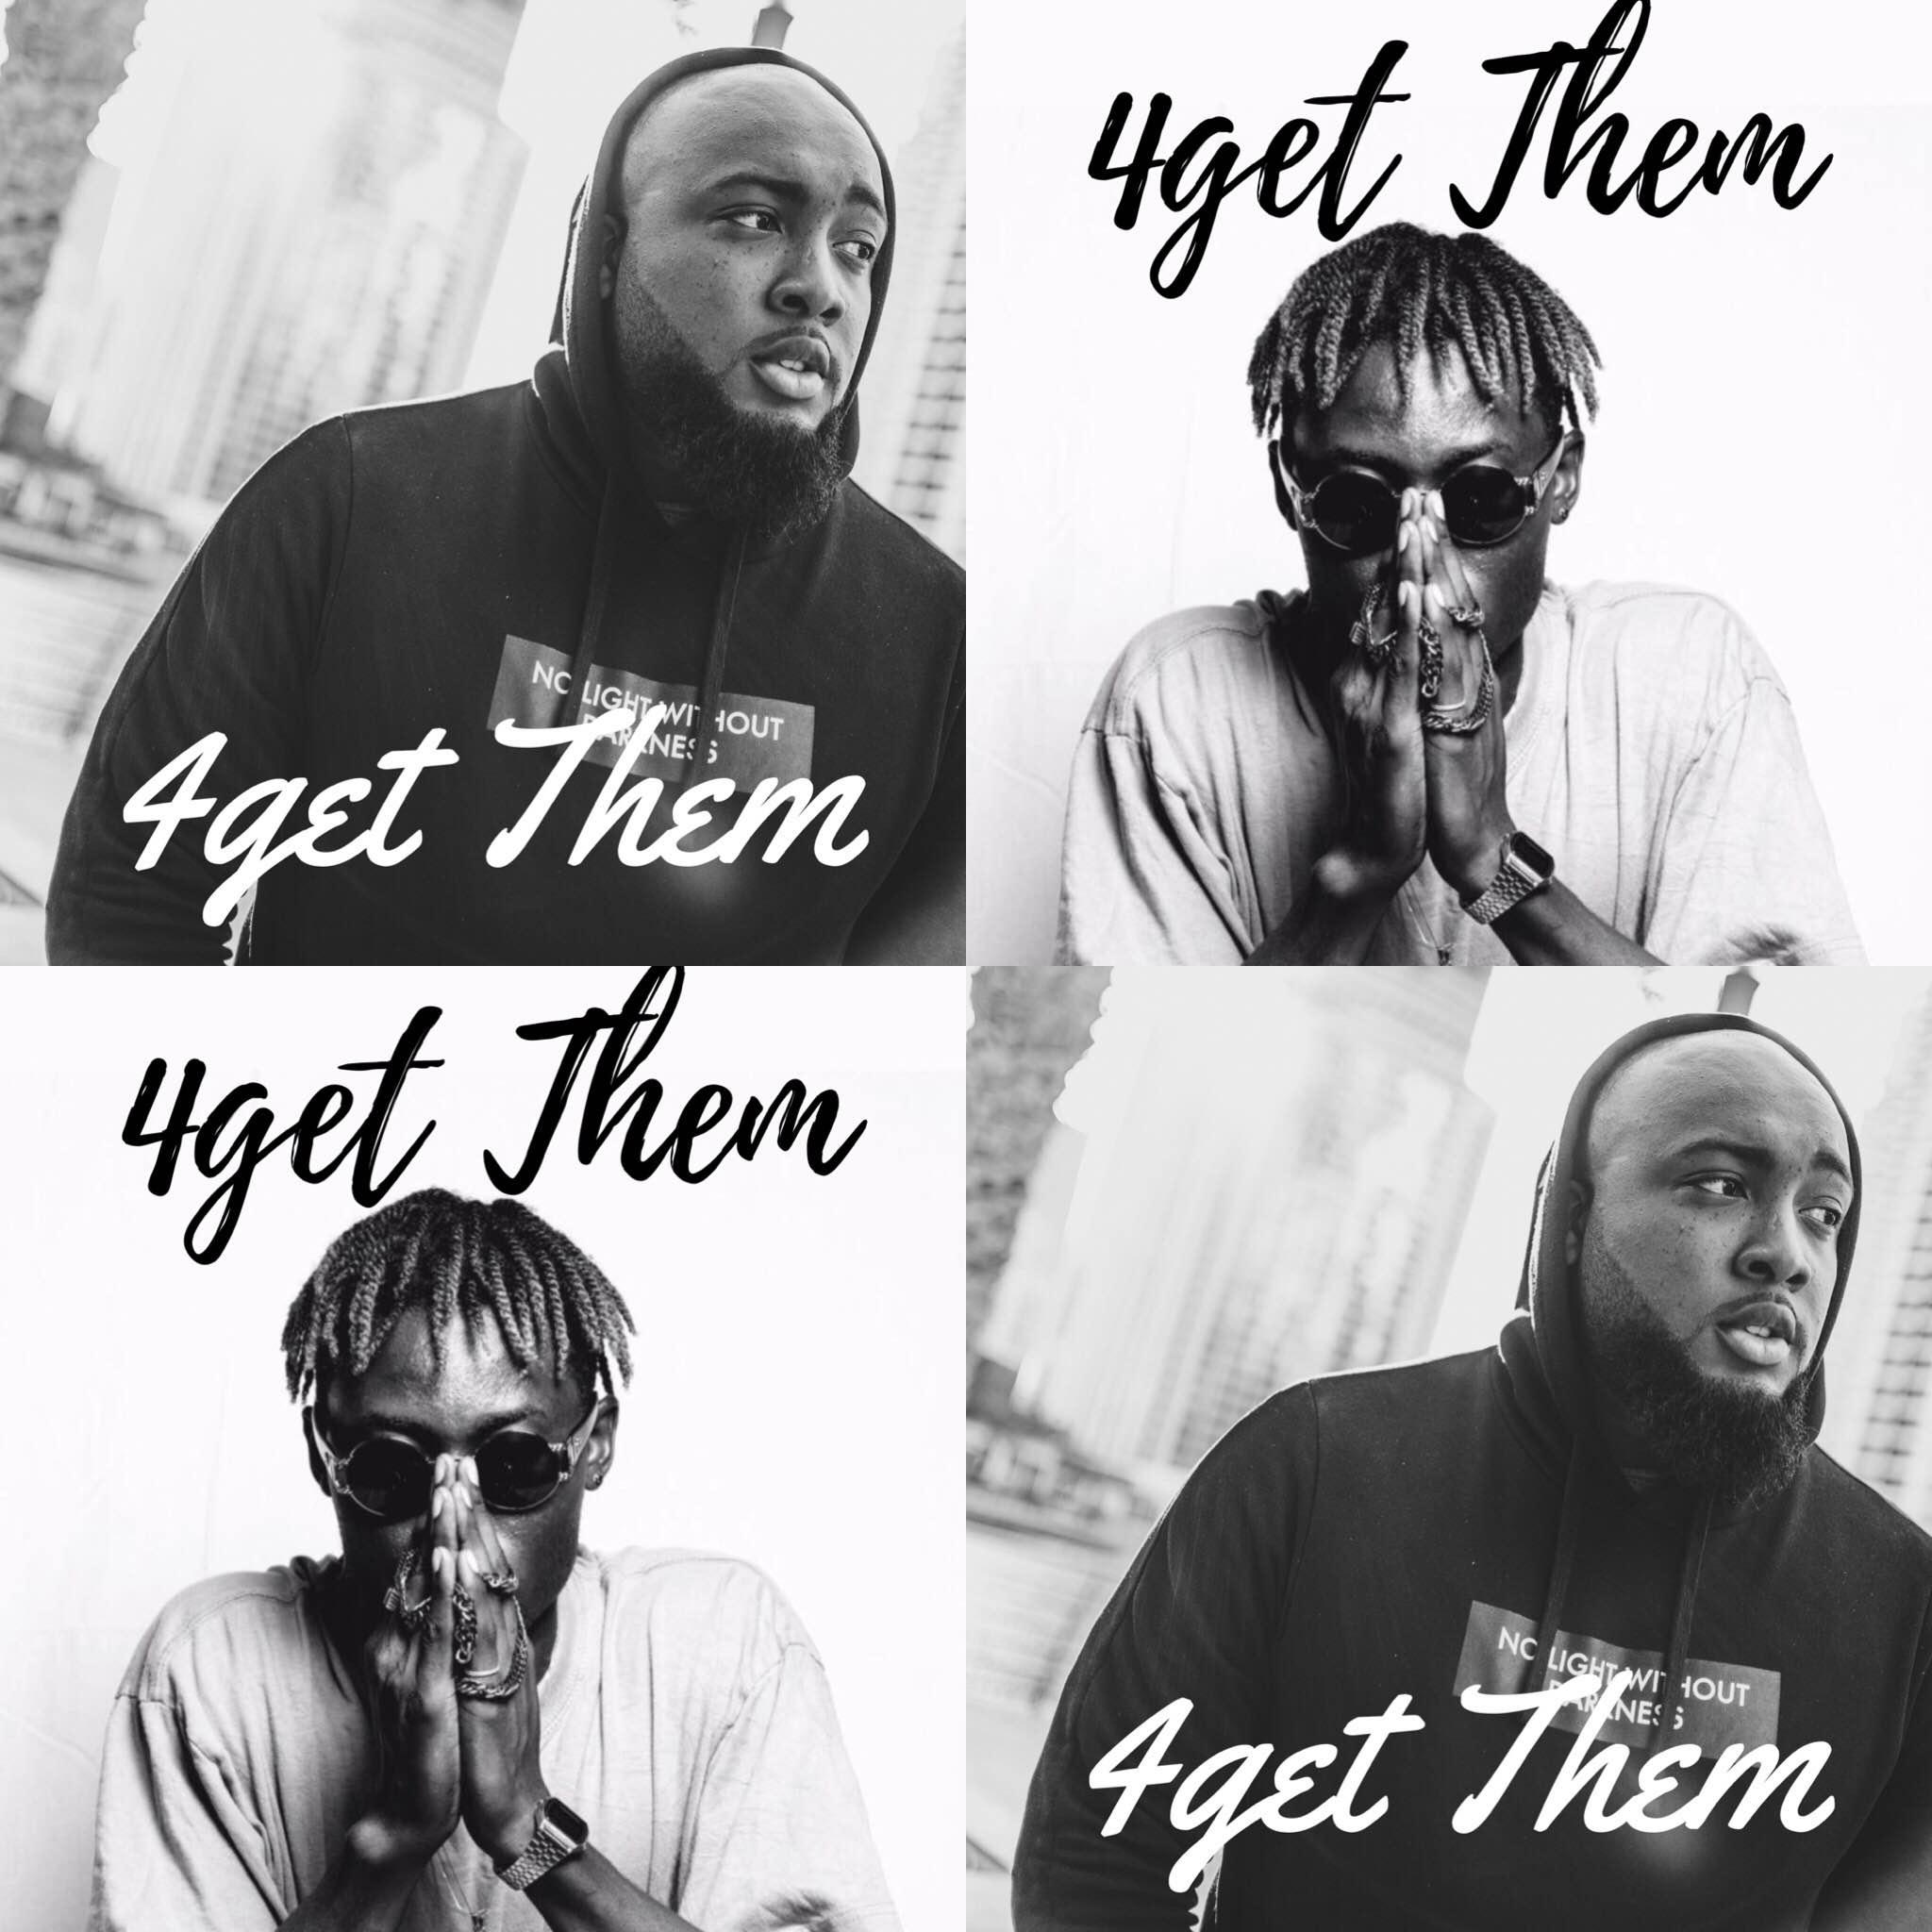 J.Town – 4get Them (Manta Da Su) ft AyAt (Prod By Drumroll)